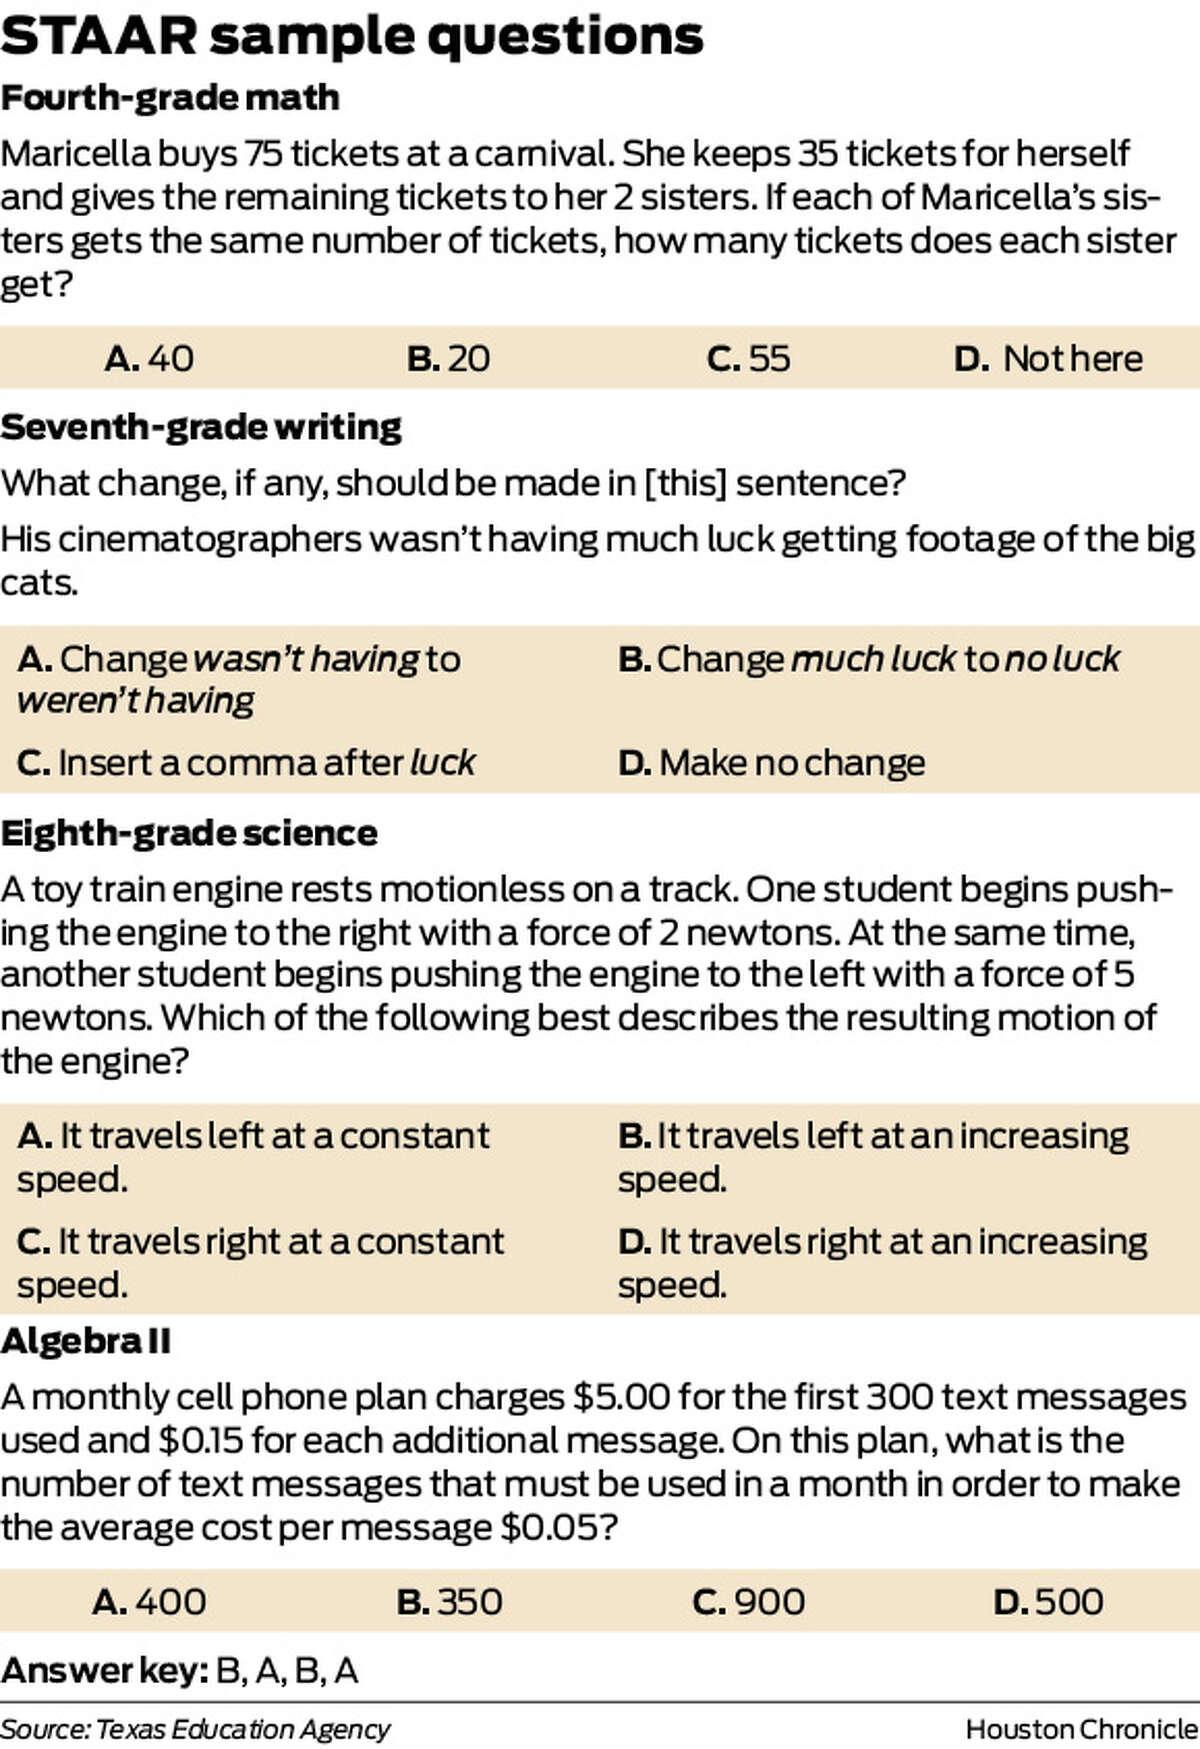 STAAR sample questions